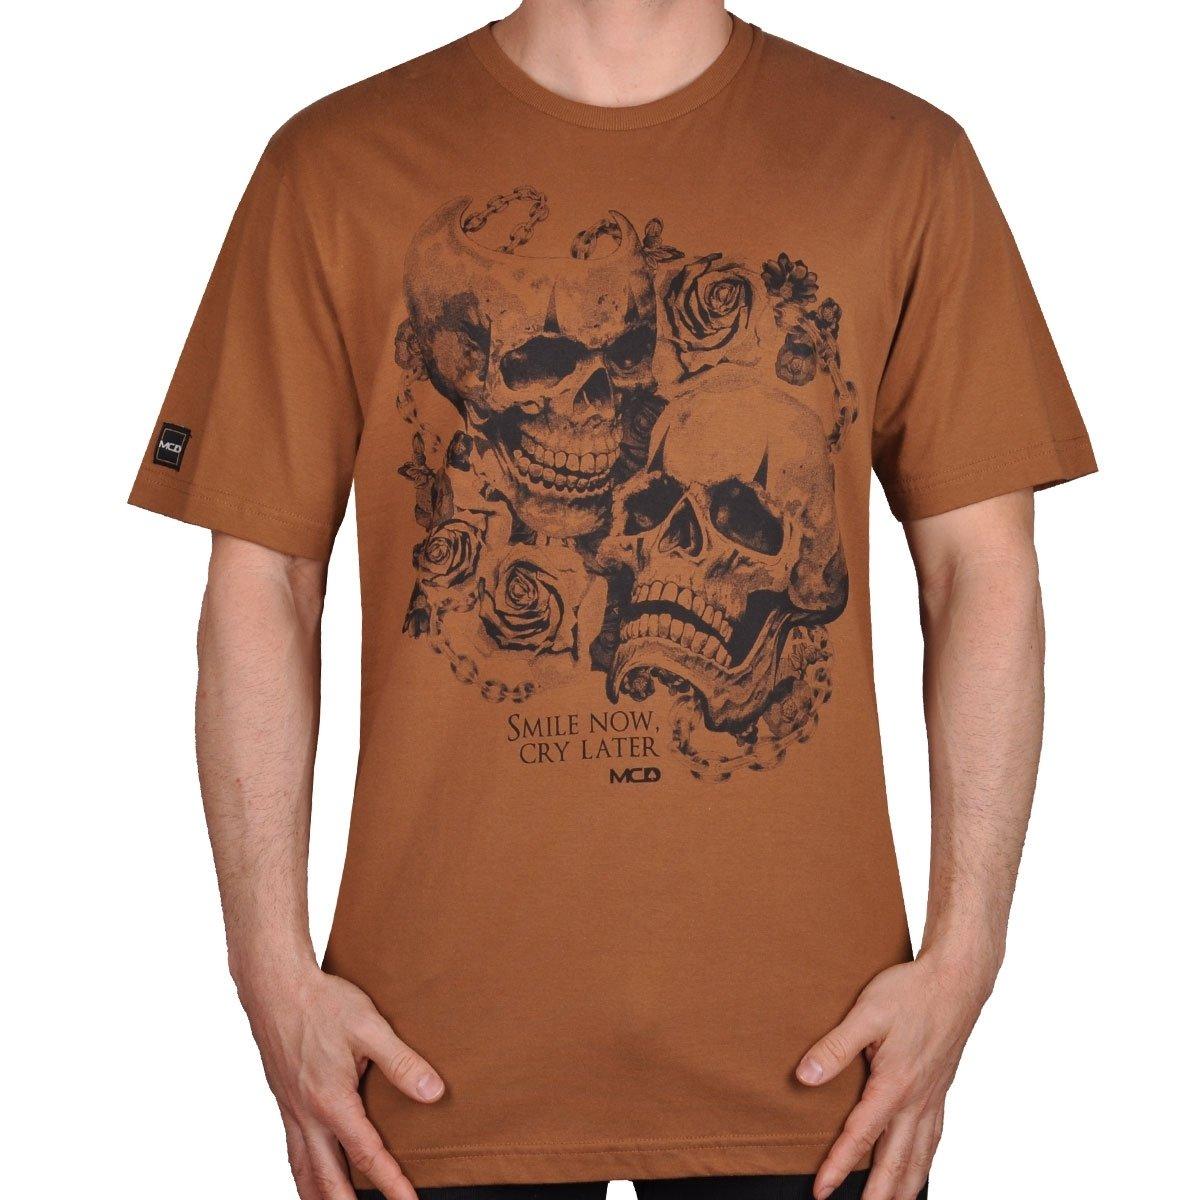 a4202ef12eb4f Camiseta Mcd Smile And Cry - Compre Agora